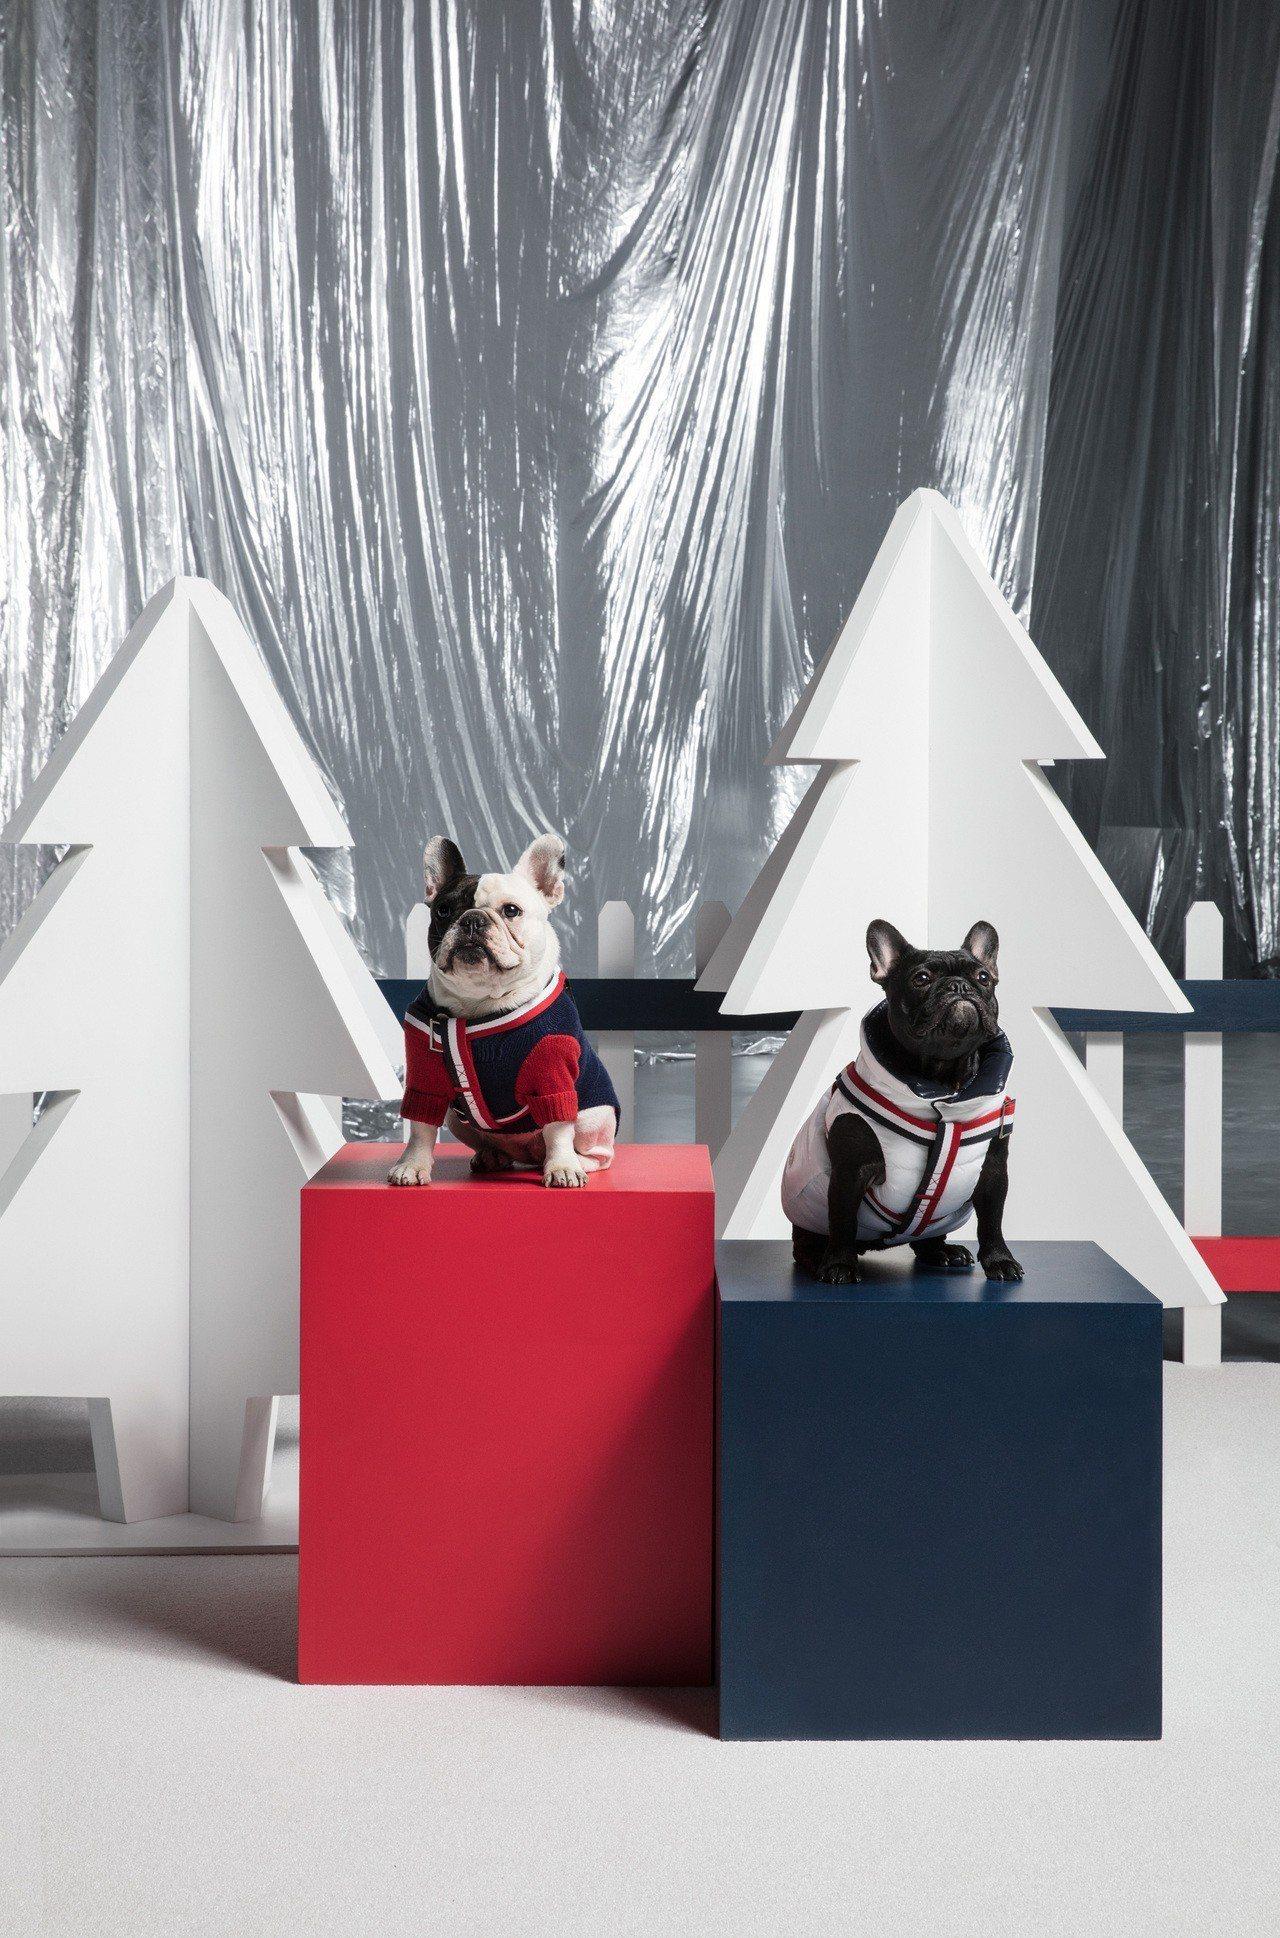 MONCLER Poldo Dog Couture愛犬訂製服系列有可拆卸的風帽款...